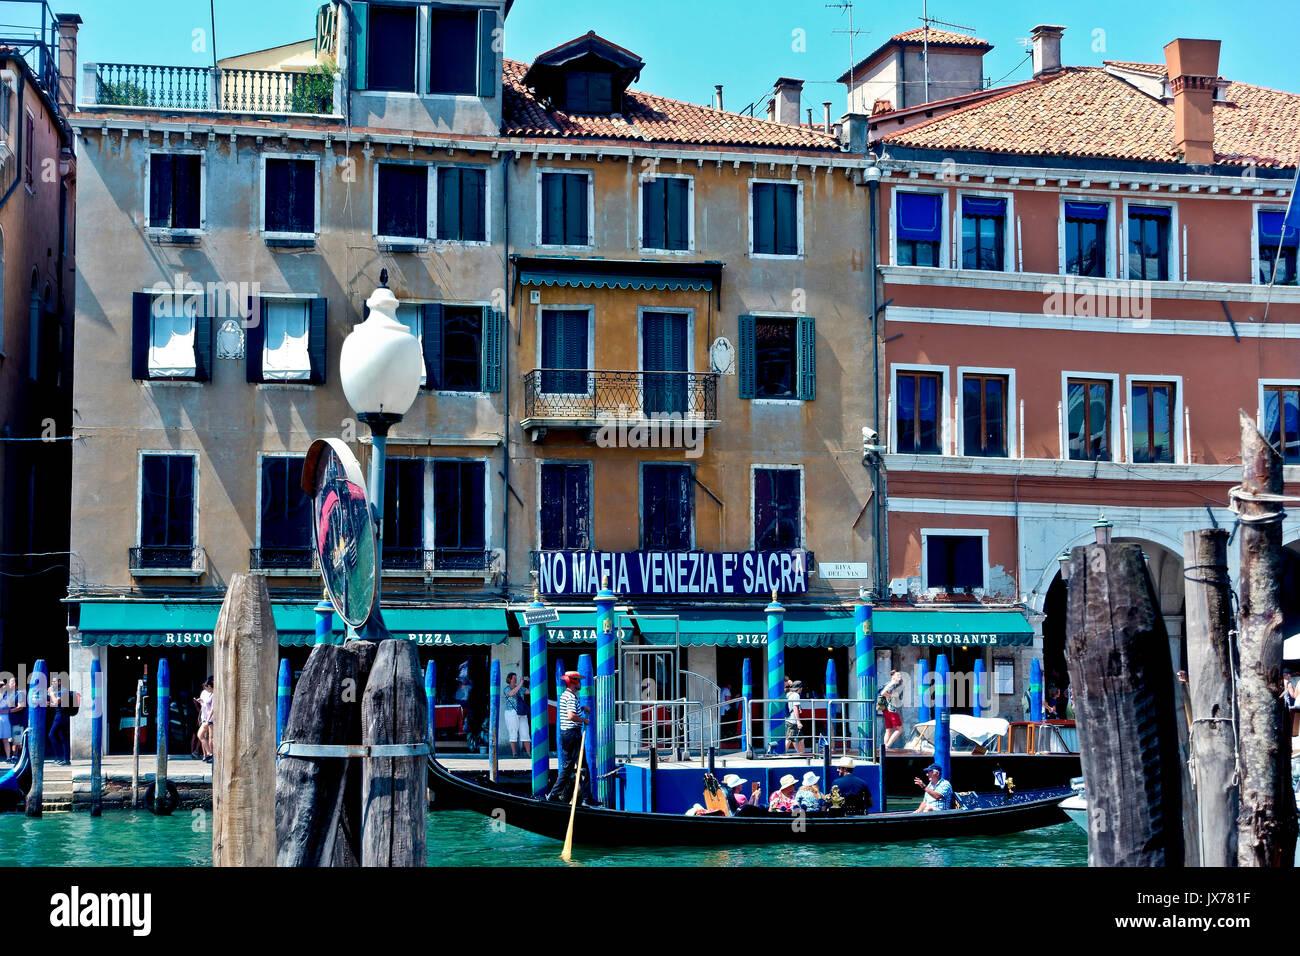 "Grand Canal. Banner reading ""No Mafia Venice is sacred"". Pillars. UNESCO world heritage site. Venice, Veneto, Italy, Europe - Stock Image"